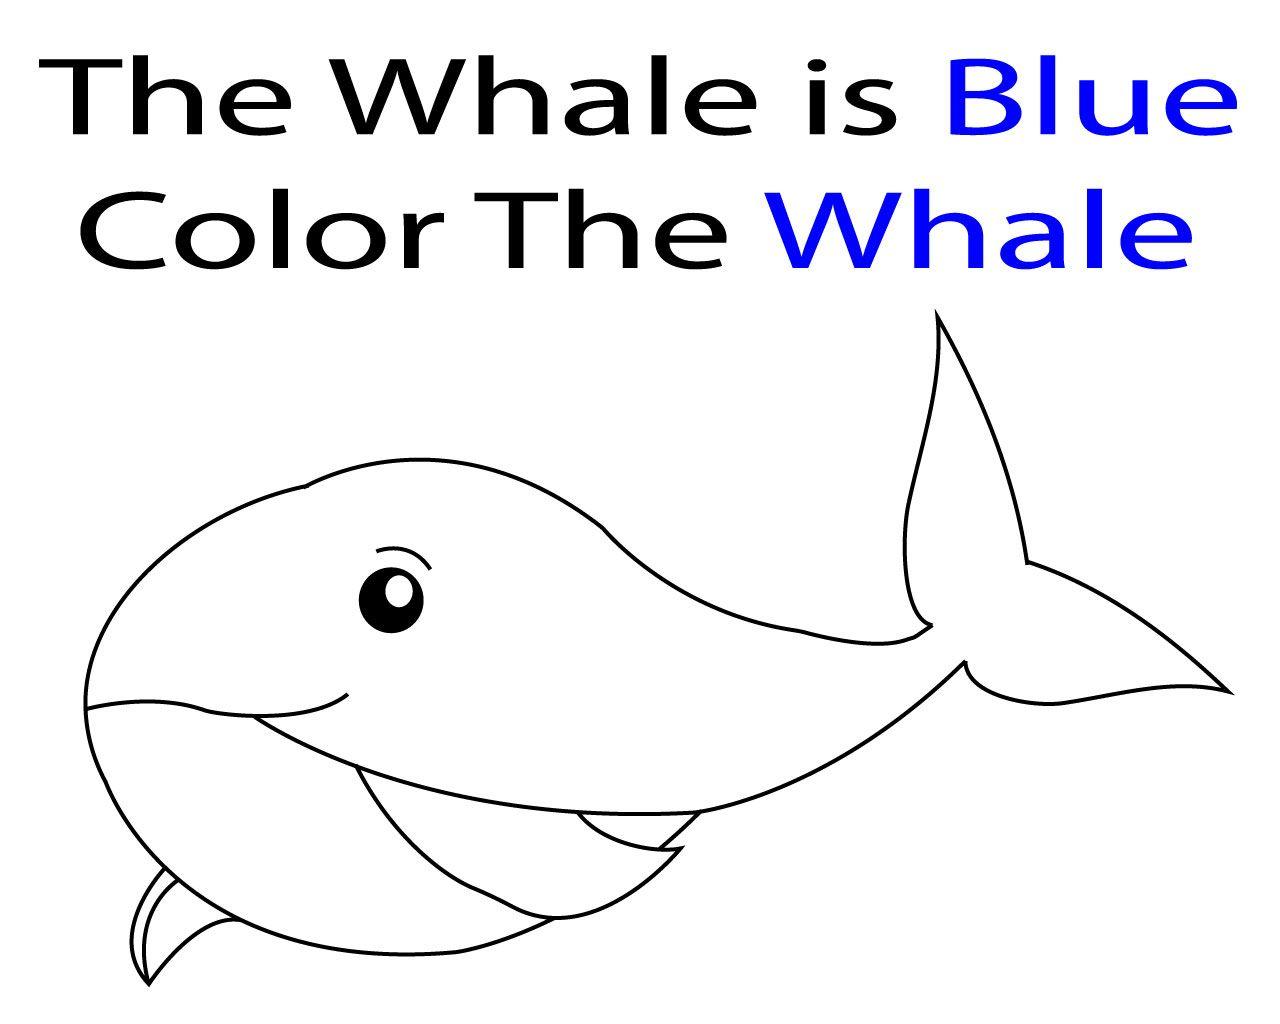 Blue Whale Coloring Pages Whale coloring pages, Coloring